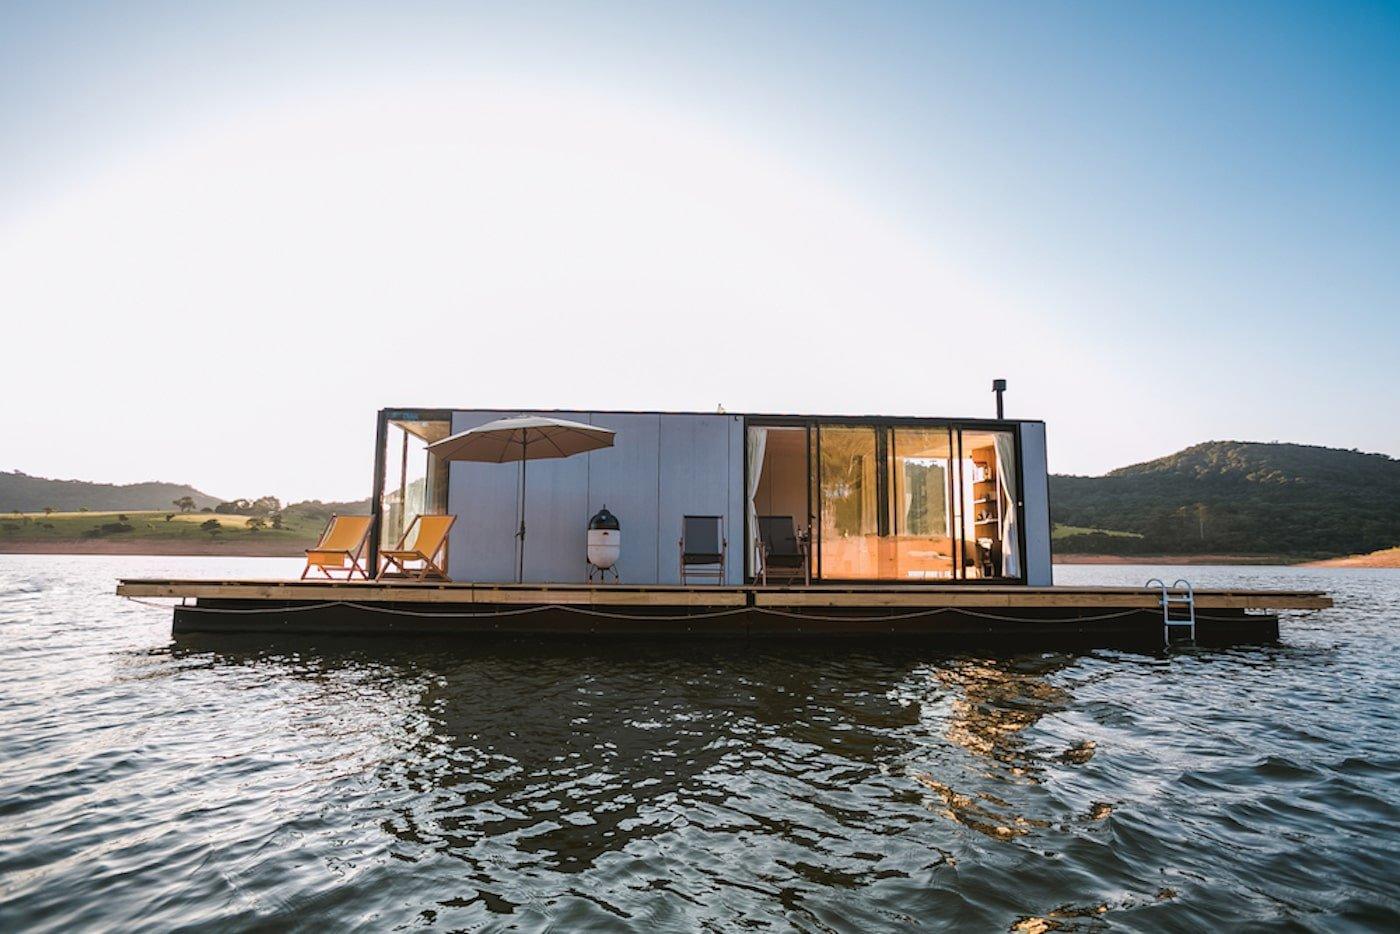 Eco Edition_SysHaus_LilliHaus_Architecture interiors 5-min